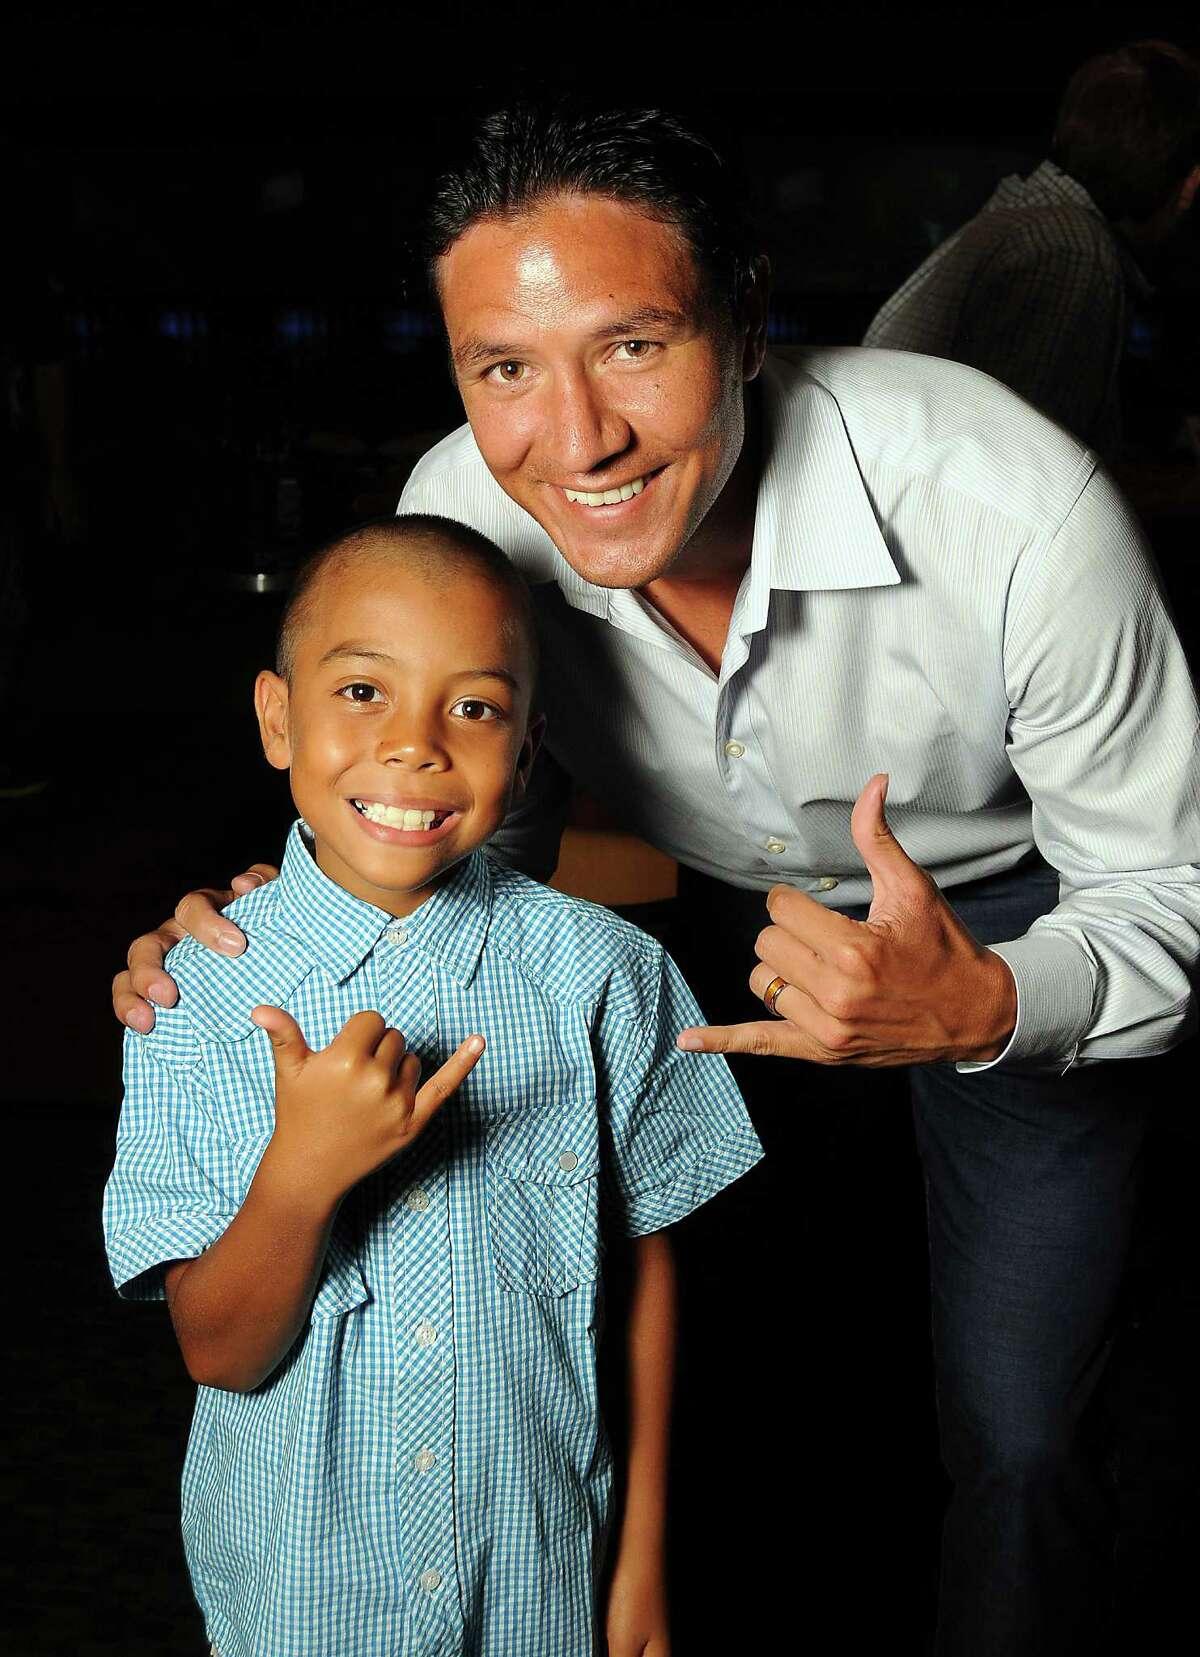 Dynamo Brian Ching and his nephew Keahi